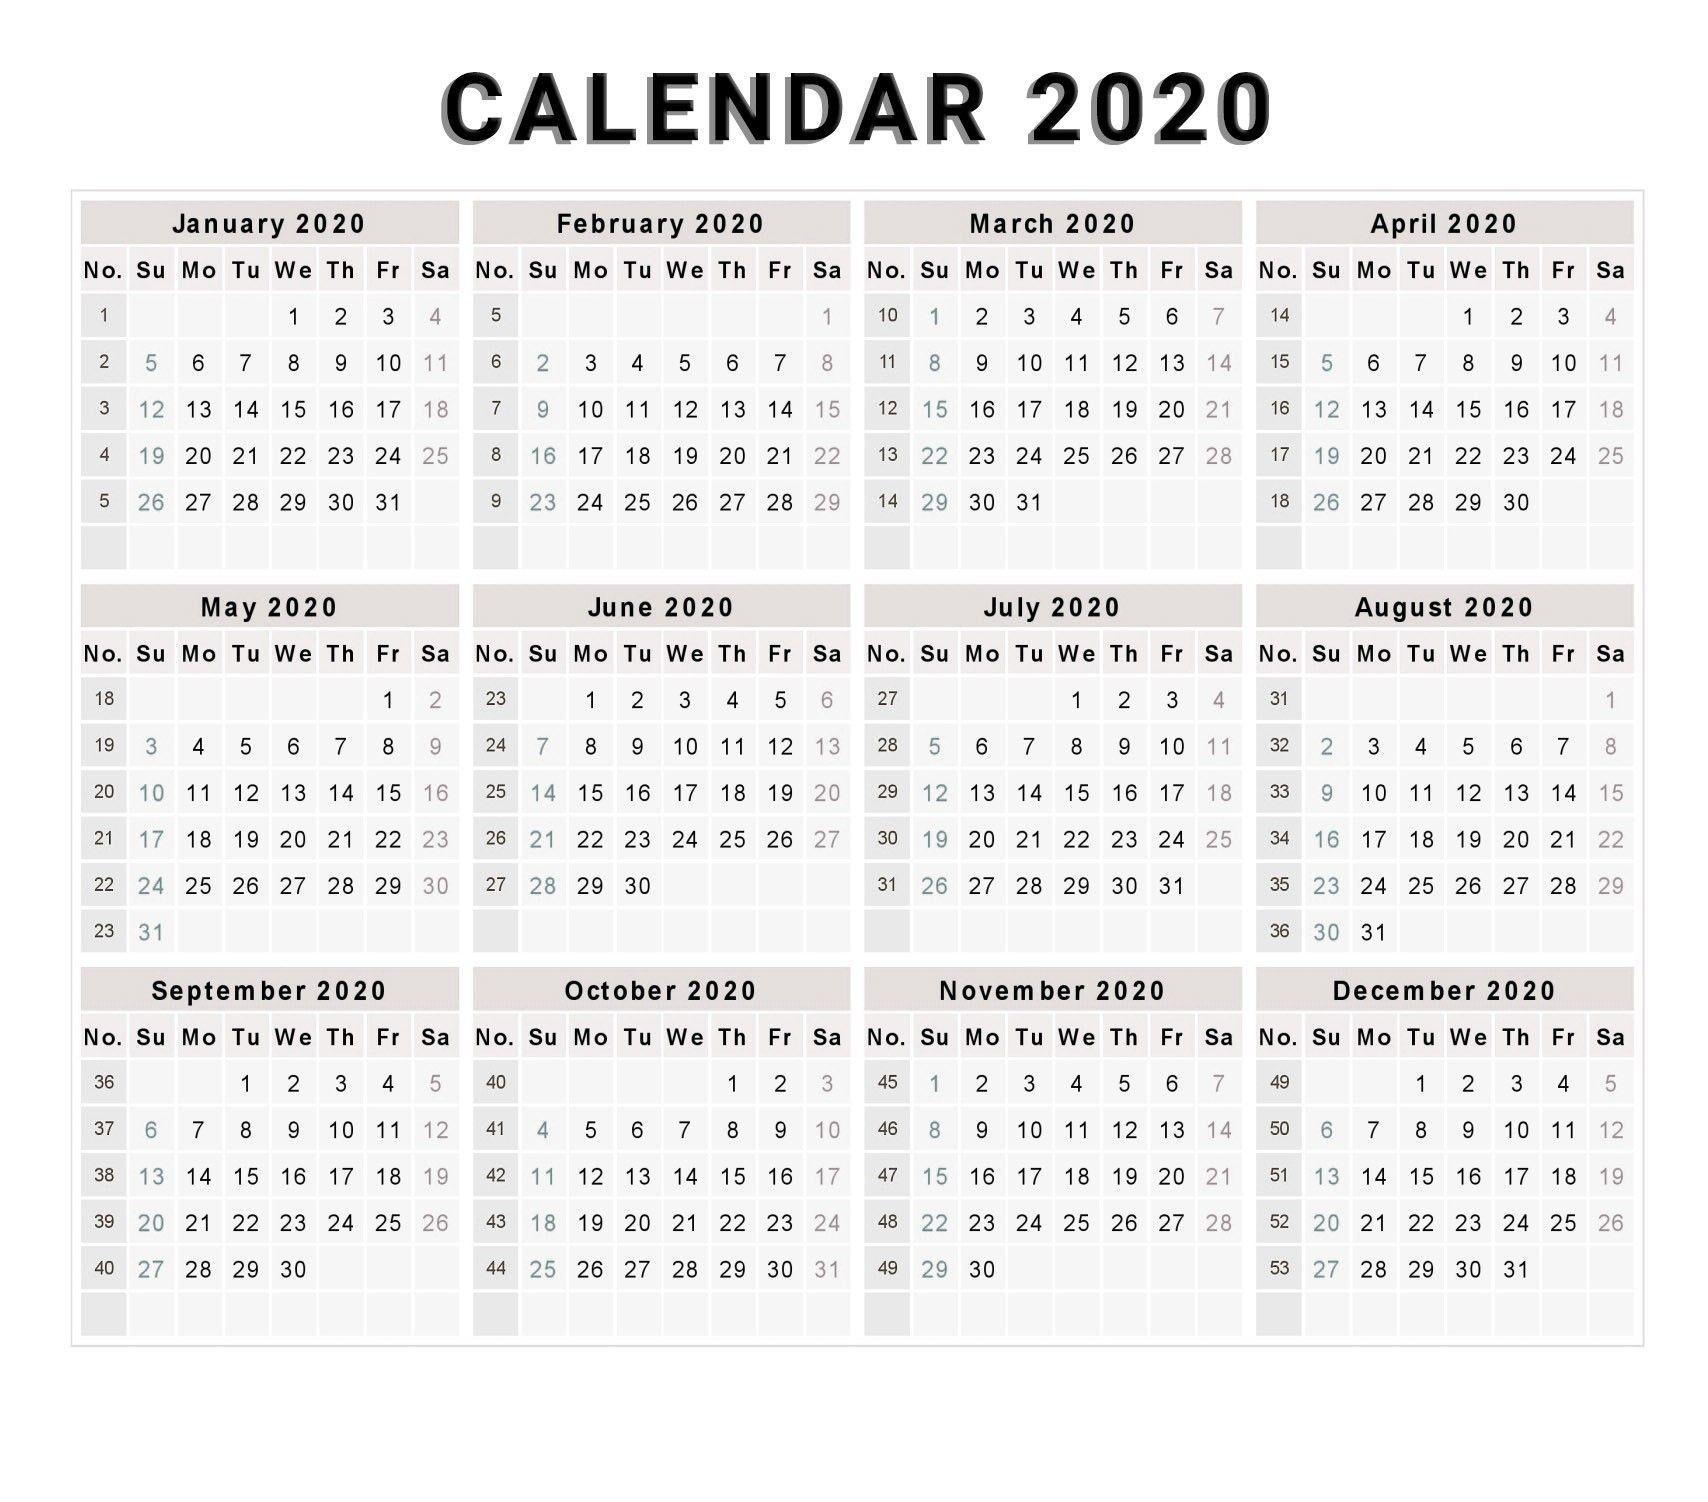 Calendar 2020 Free Printable Calendar 2020 Free 2020 in 2020 Calendar Free Printable